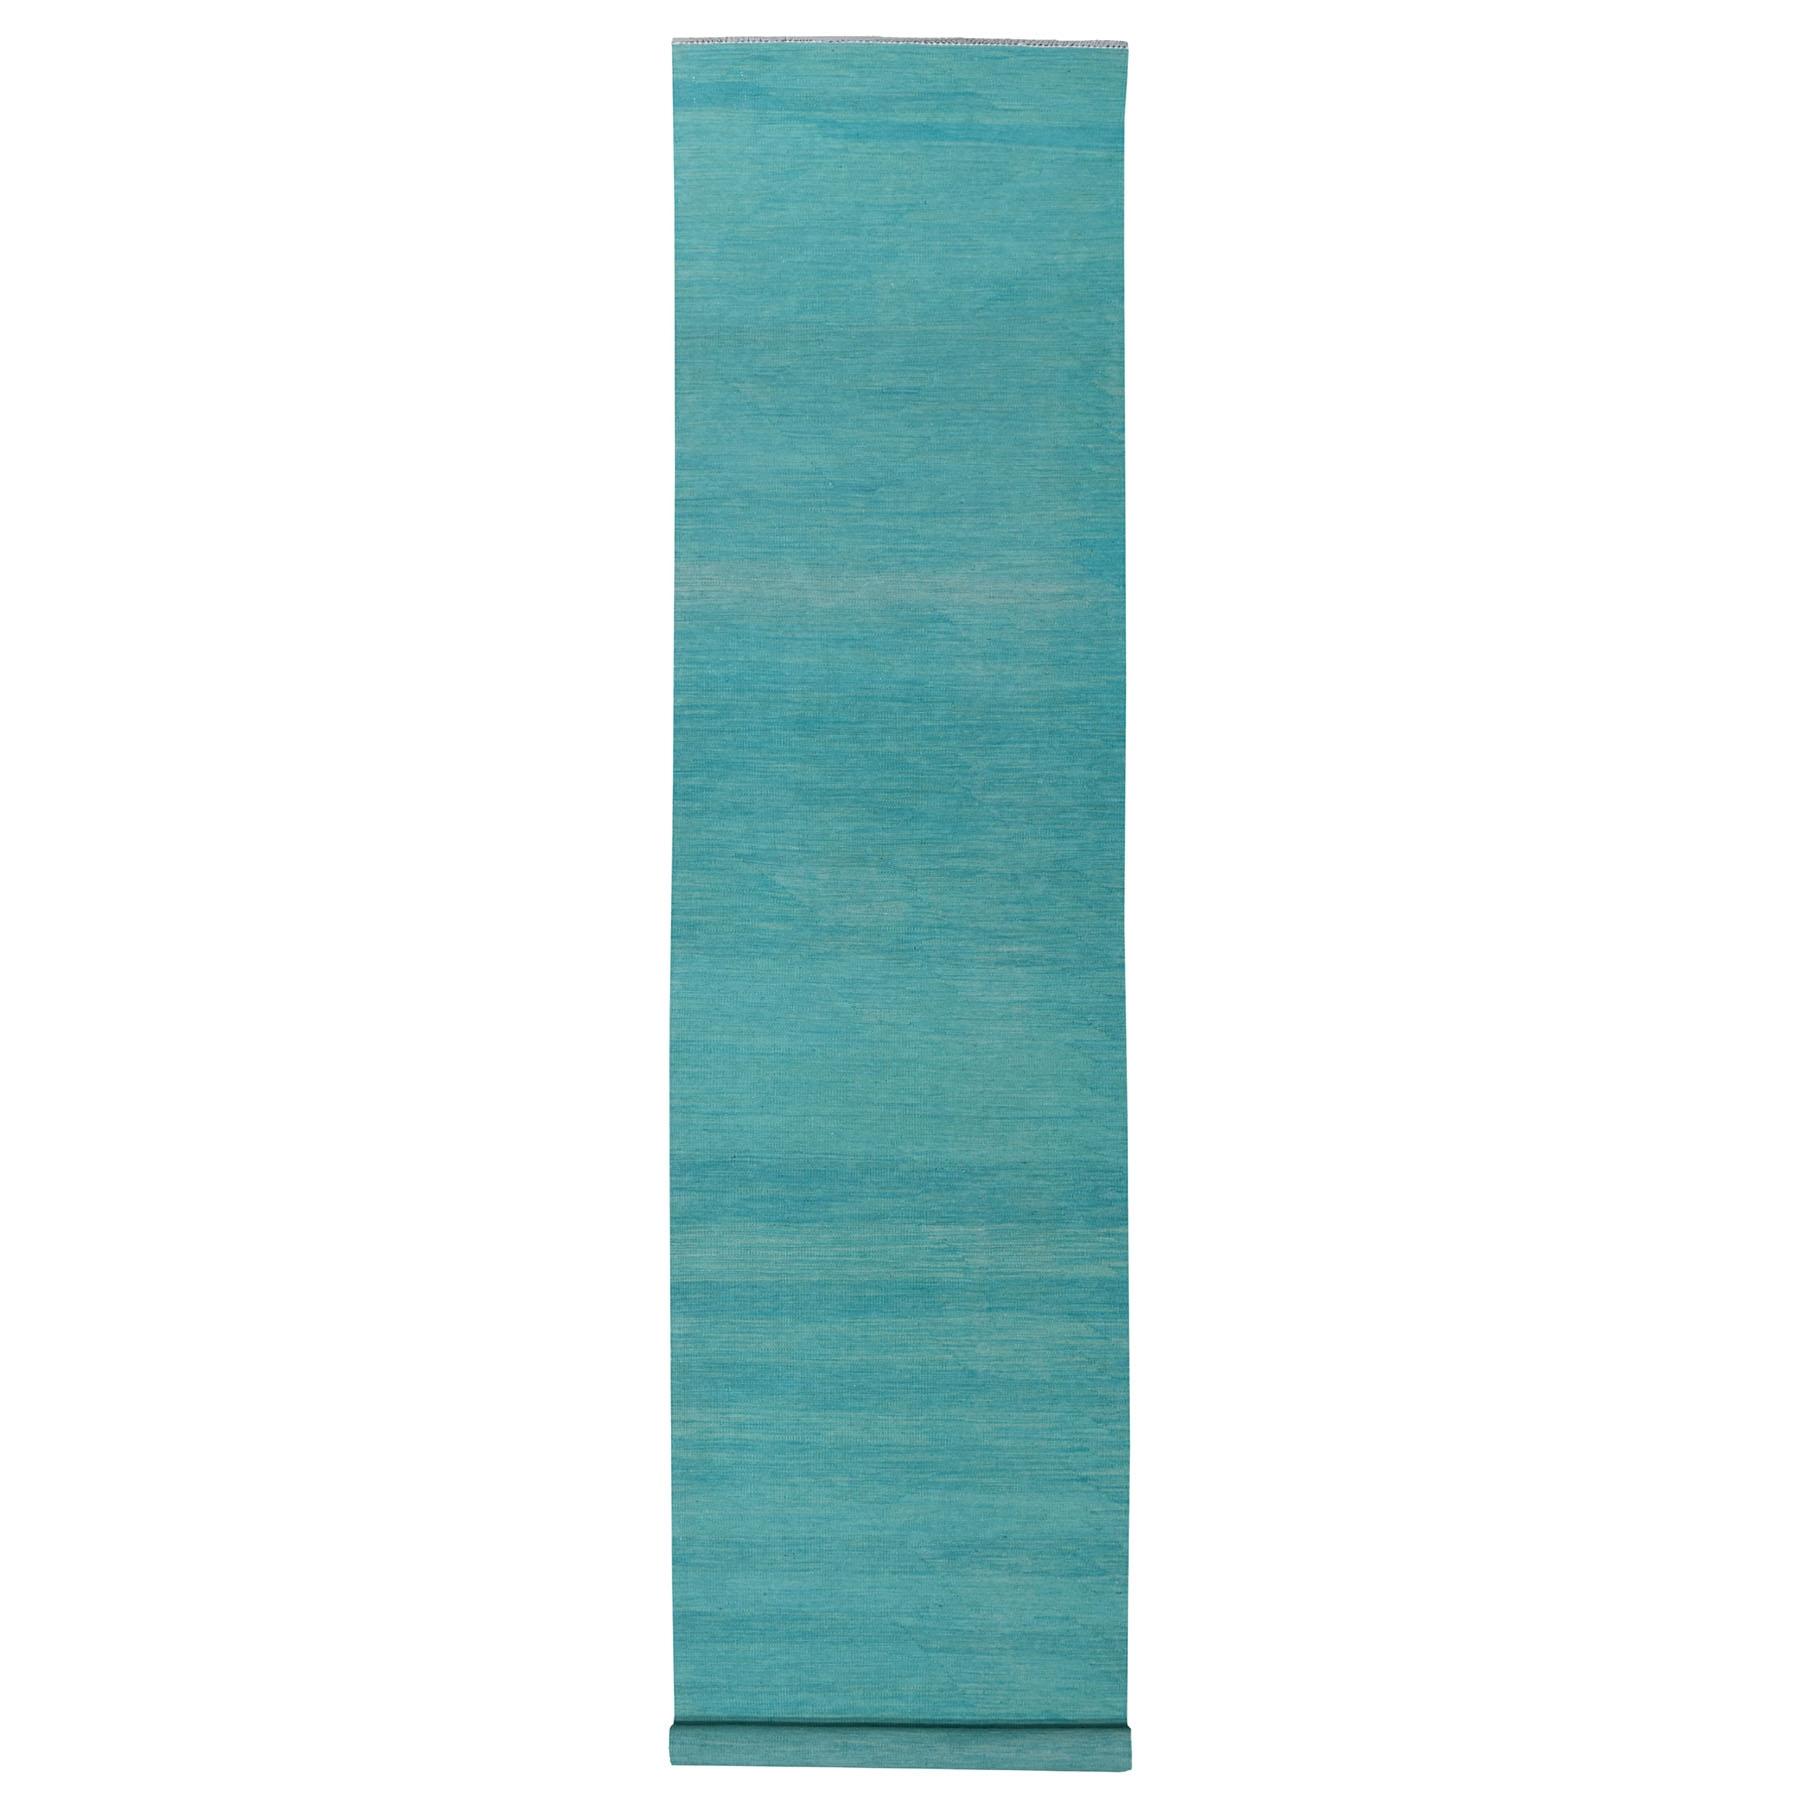 "2'7""X16'1"" Aqua Marine Shades Reversible Kilim Pure Wool Hand Woven Xl Runner Oriental Rug moaec8ba"